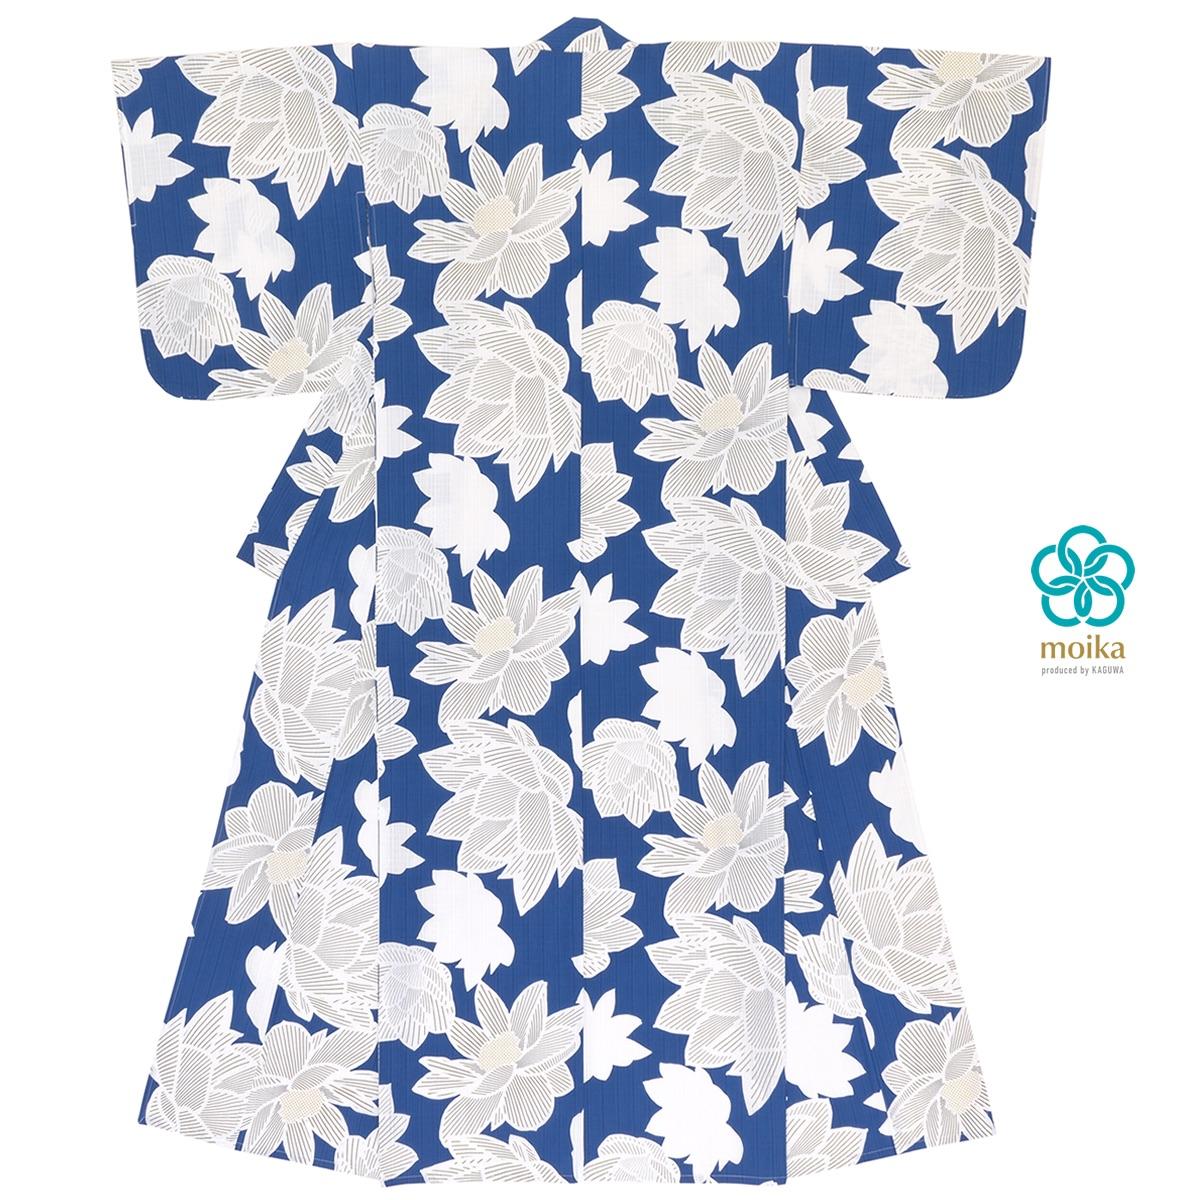 moika 浴衣 レディース 単品 Mサイズ レトロ 青 ブルー 蓮 花 フラワー 衿芯付き 女性用 仕立て上がり